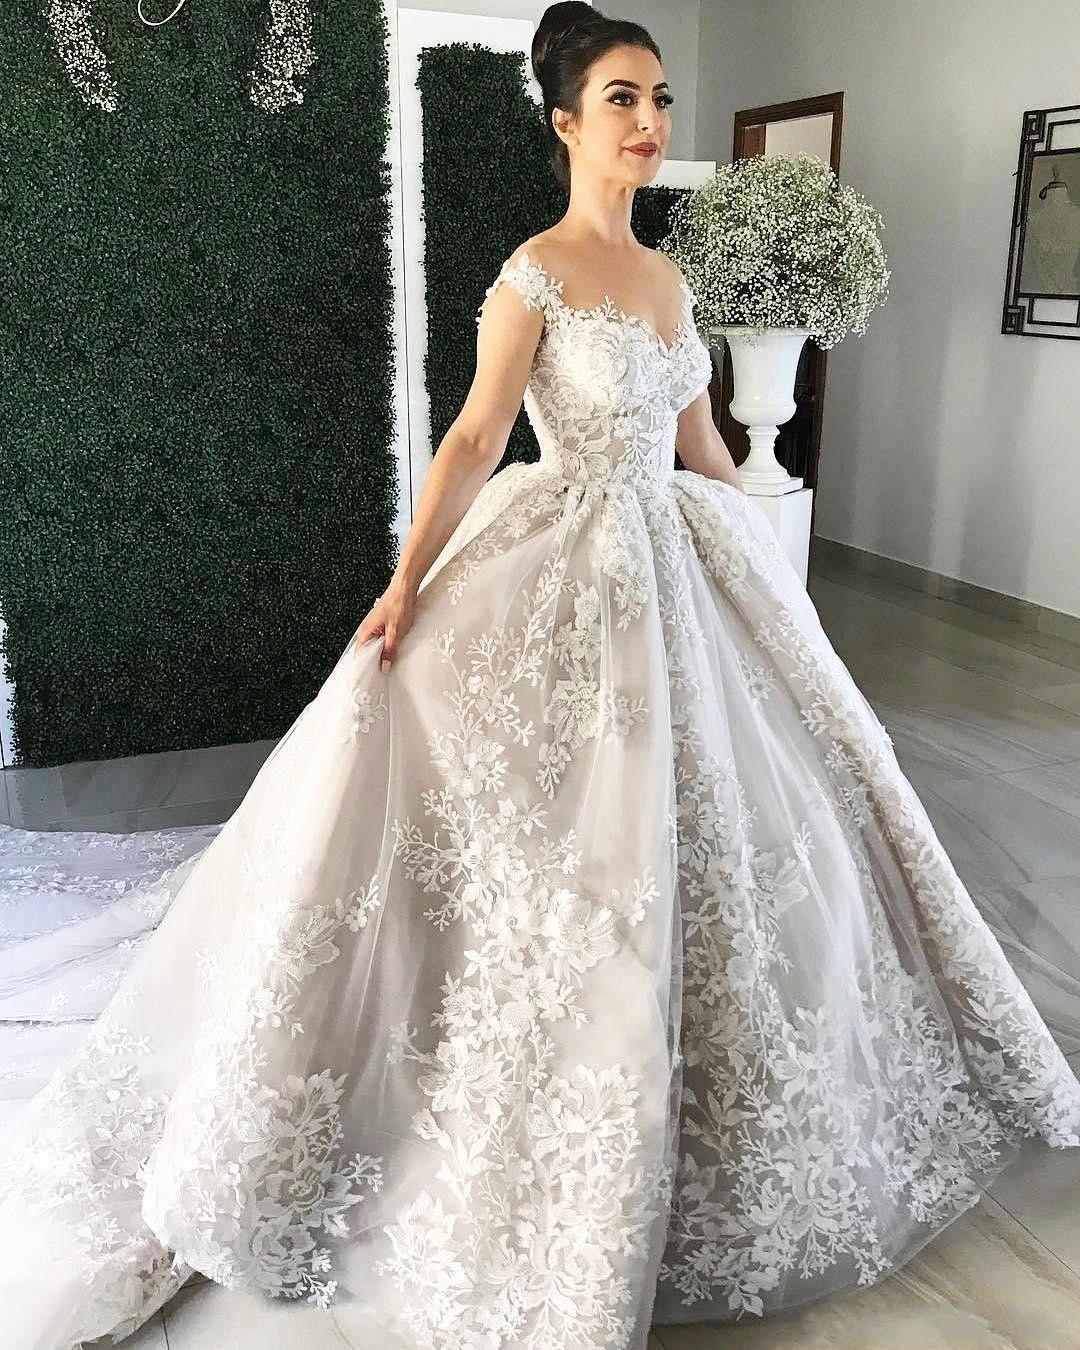 2019 Luxury Arabic Ball Gown Wedding Dresses Sheer Neckline